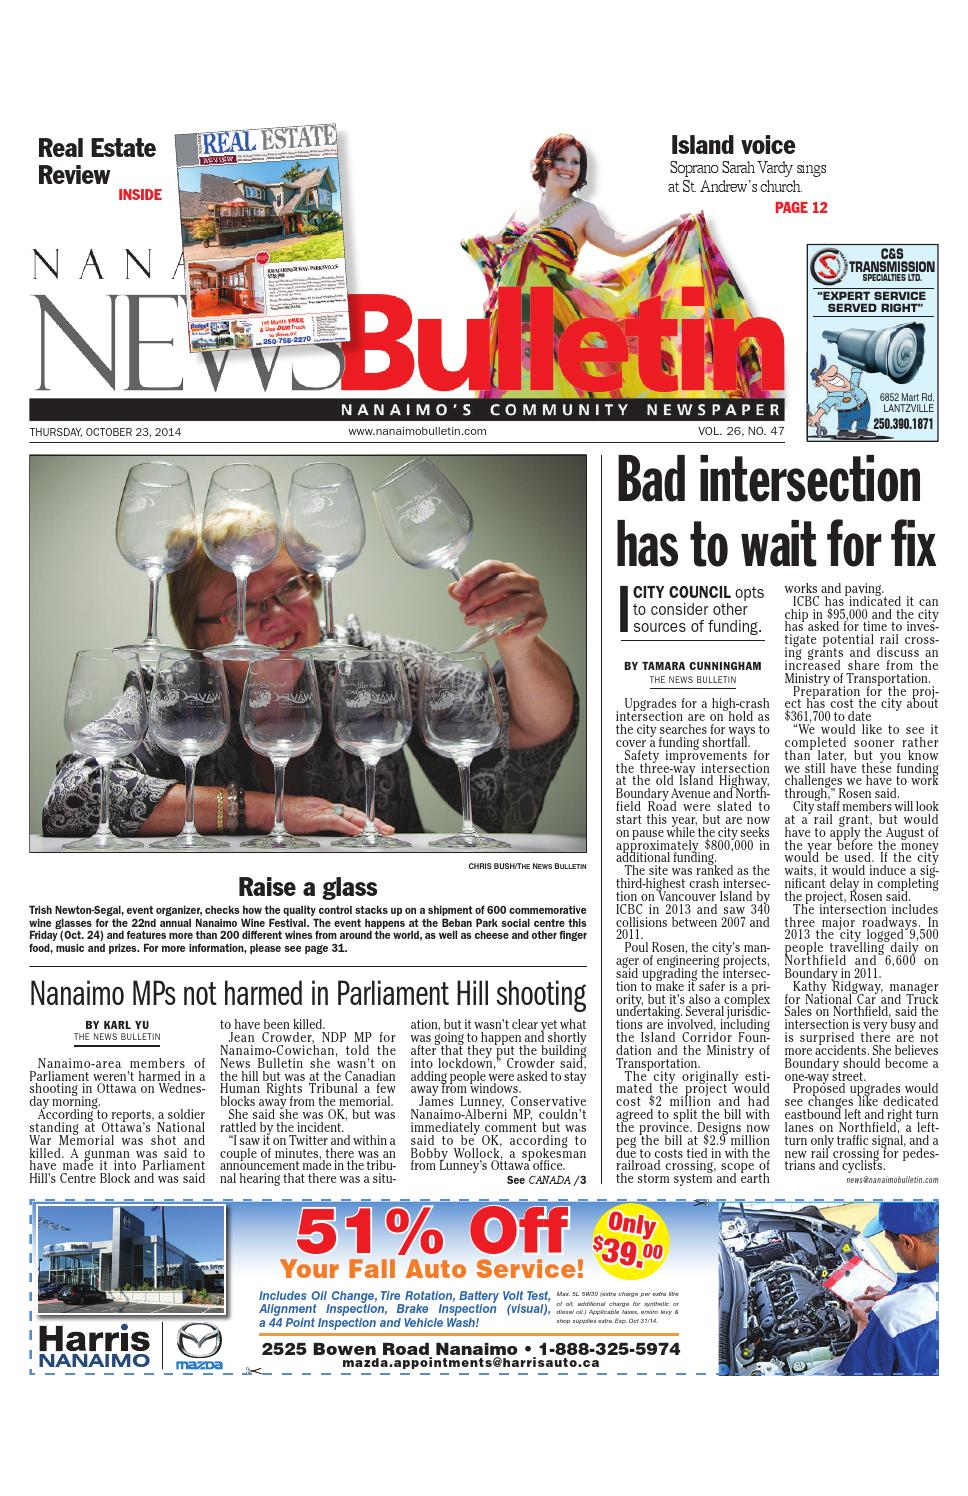 Bathmaster Nanaimo nanaimo news bulletin, october 23, 2014black press - issuu